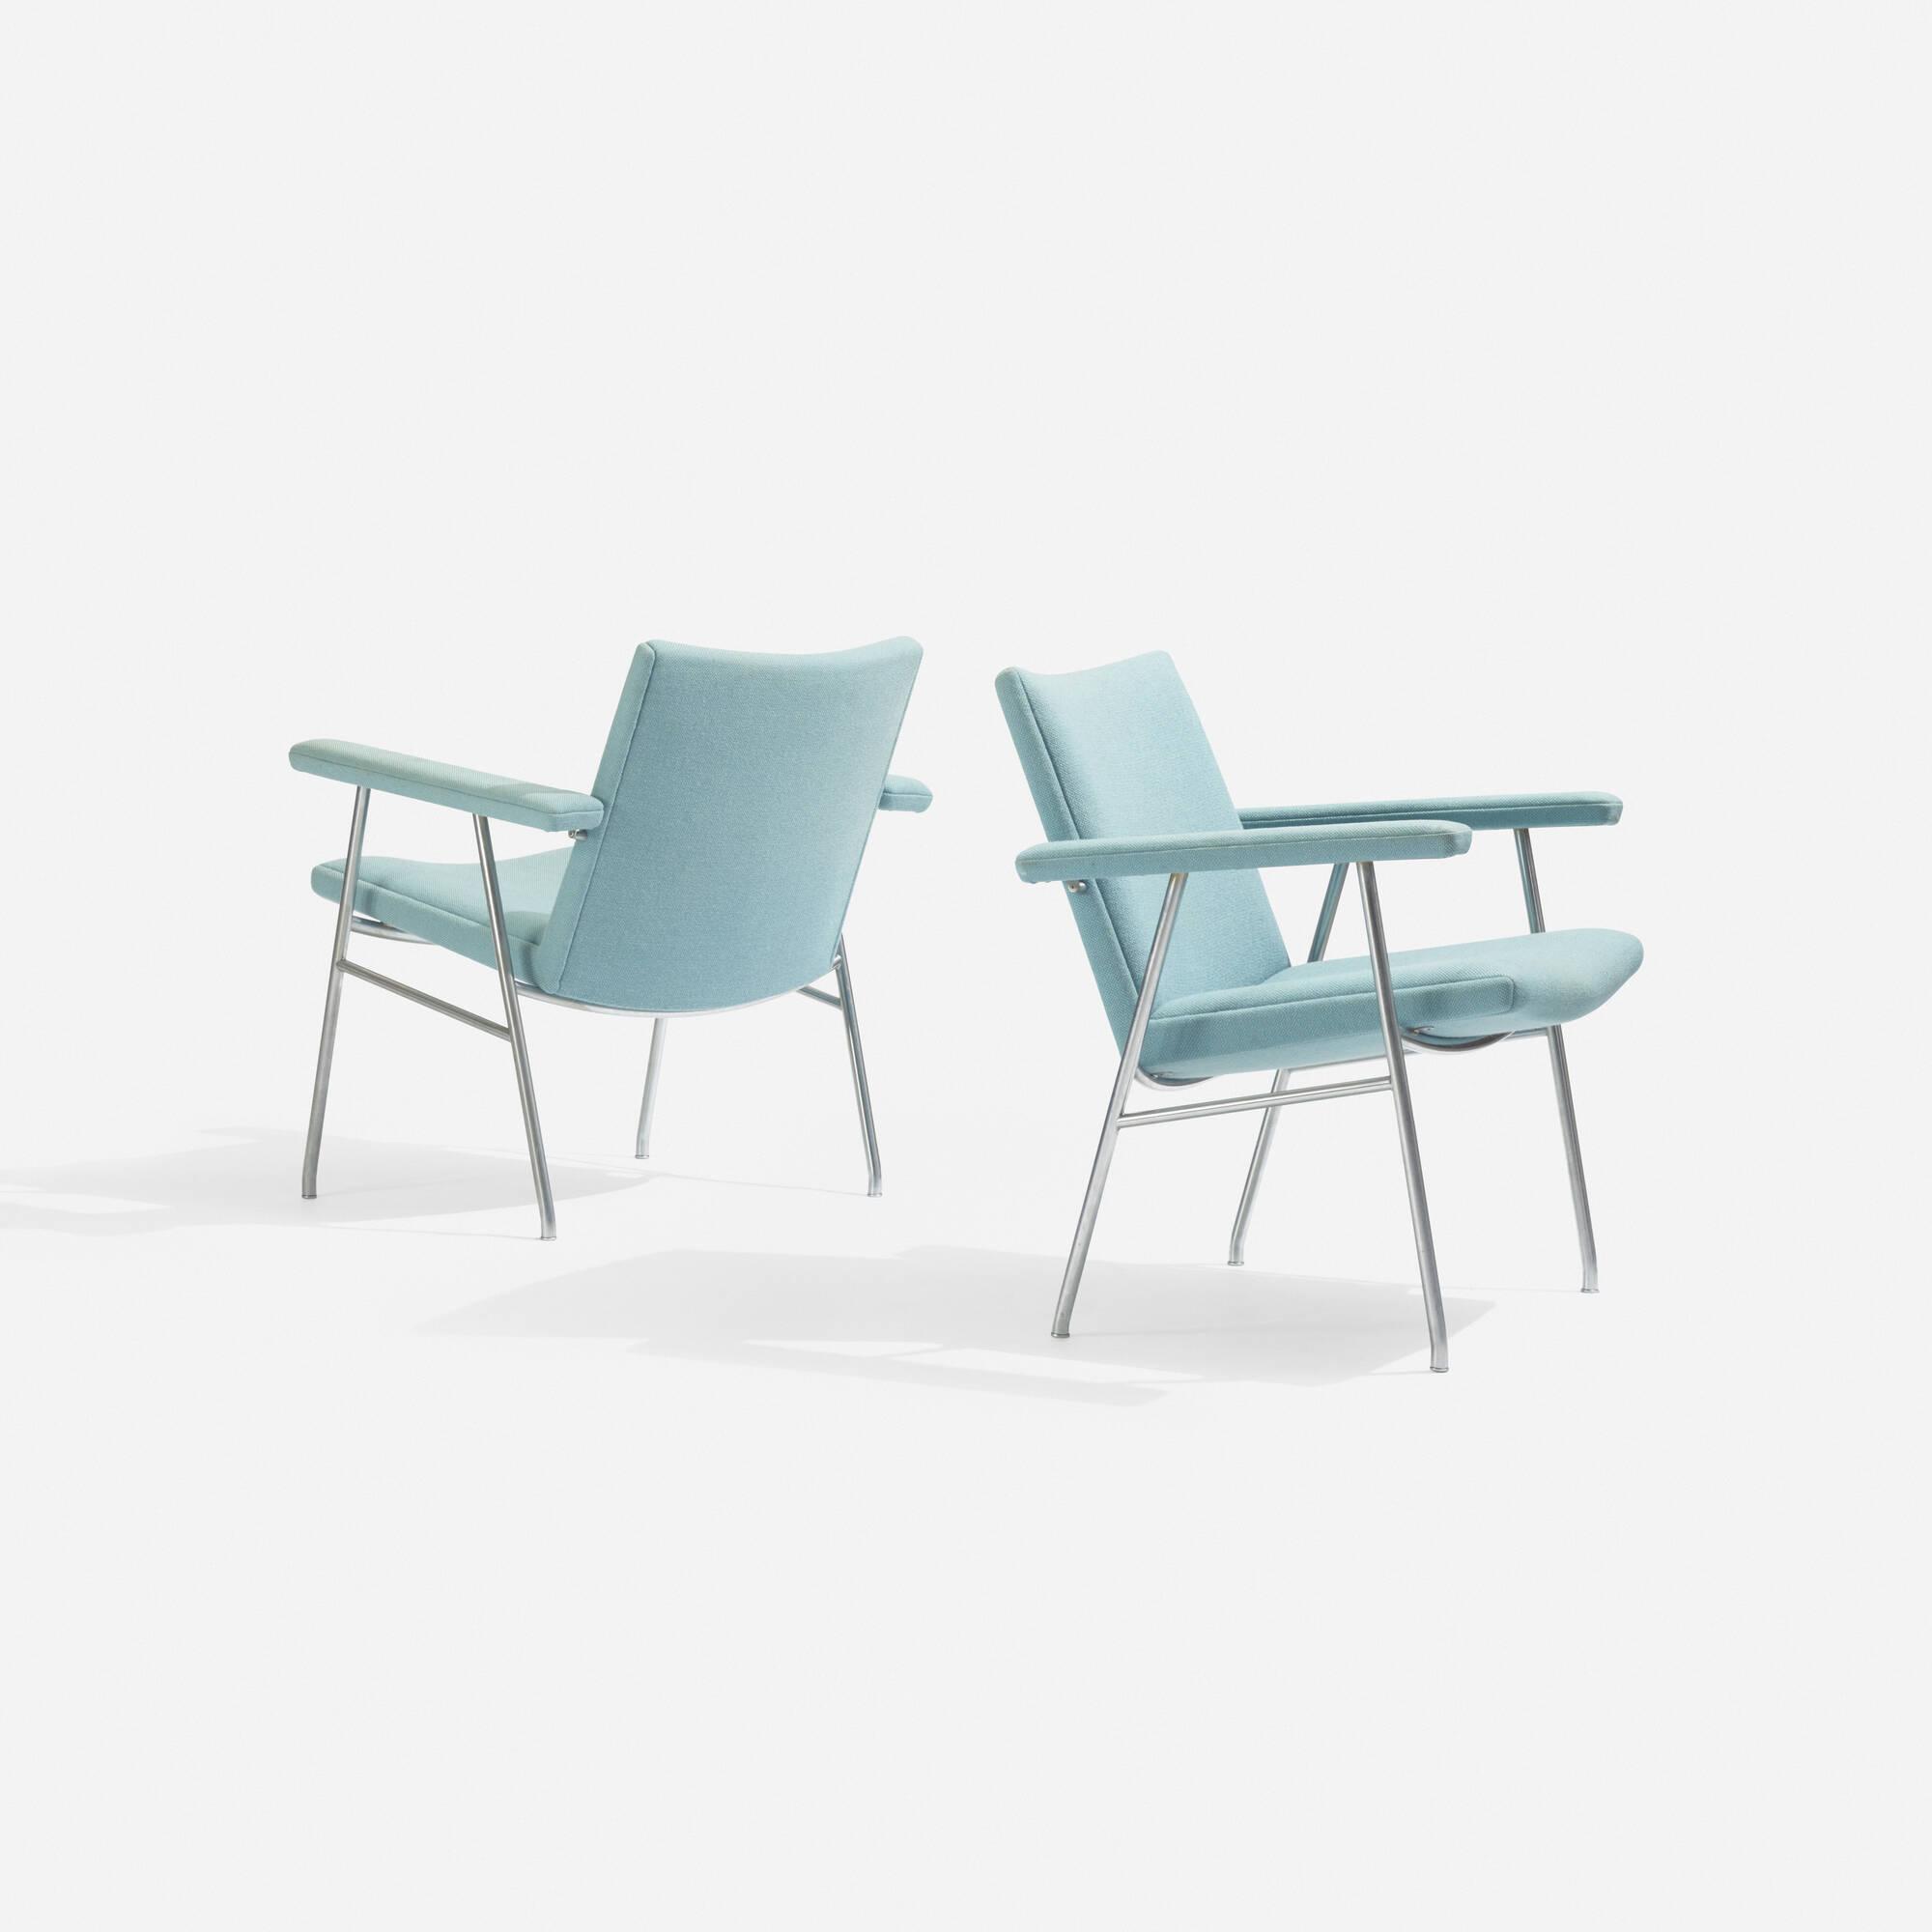 129: Hans J. Wegner / lounge chairs model AP 52, pair (1 of 3)